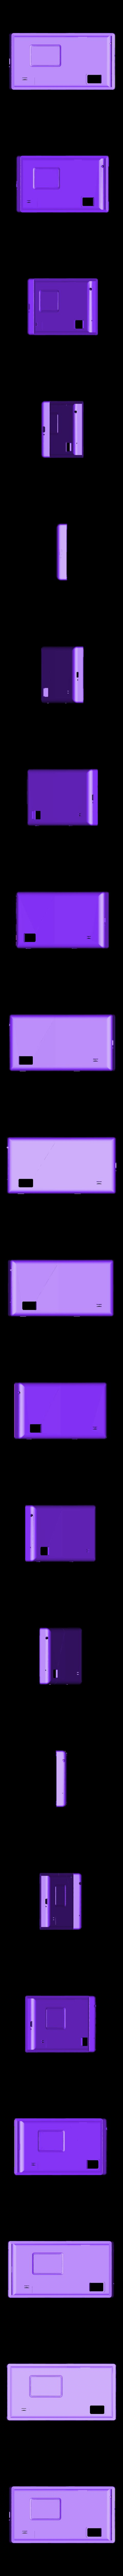 cova102.stl Download free STL file Fairphone 2 cover • 3D printer model, unwohlpol